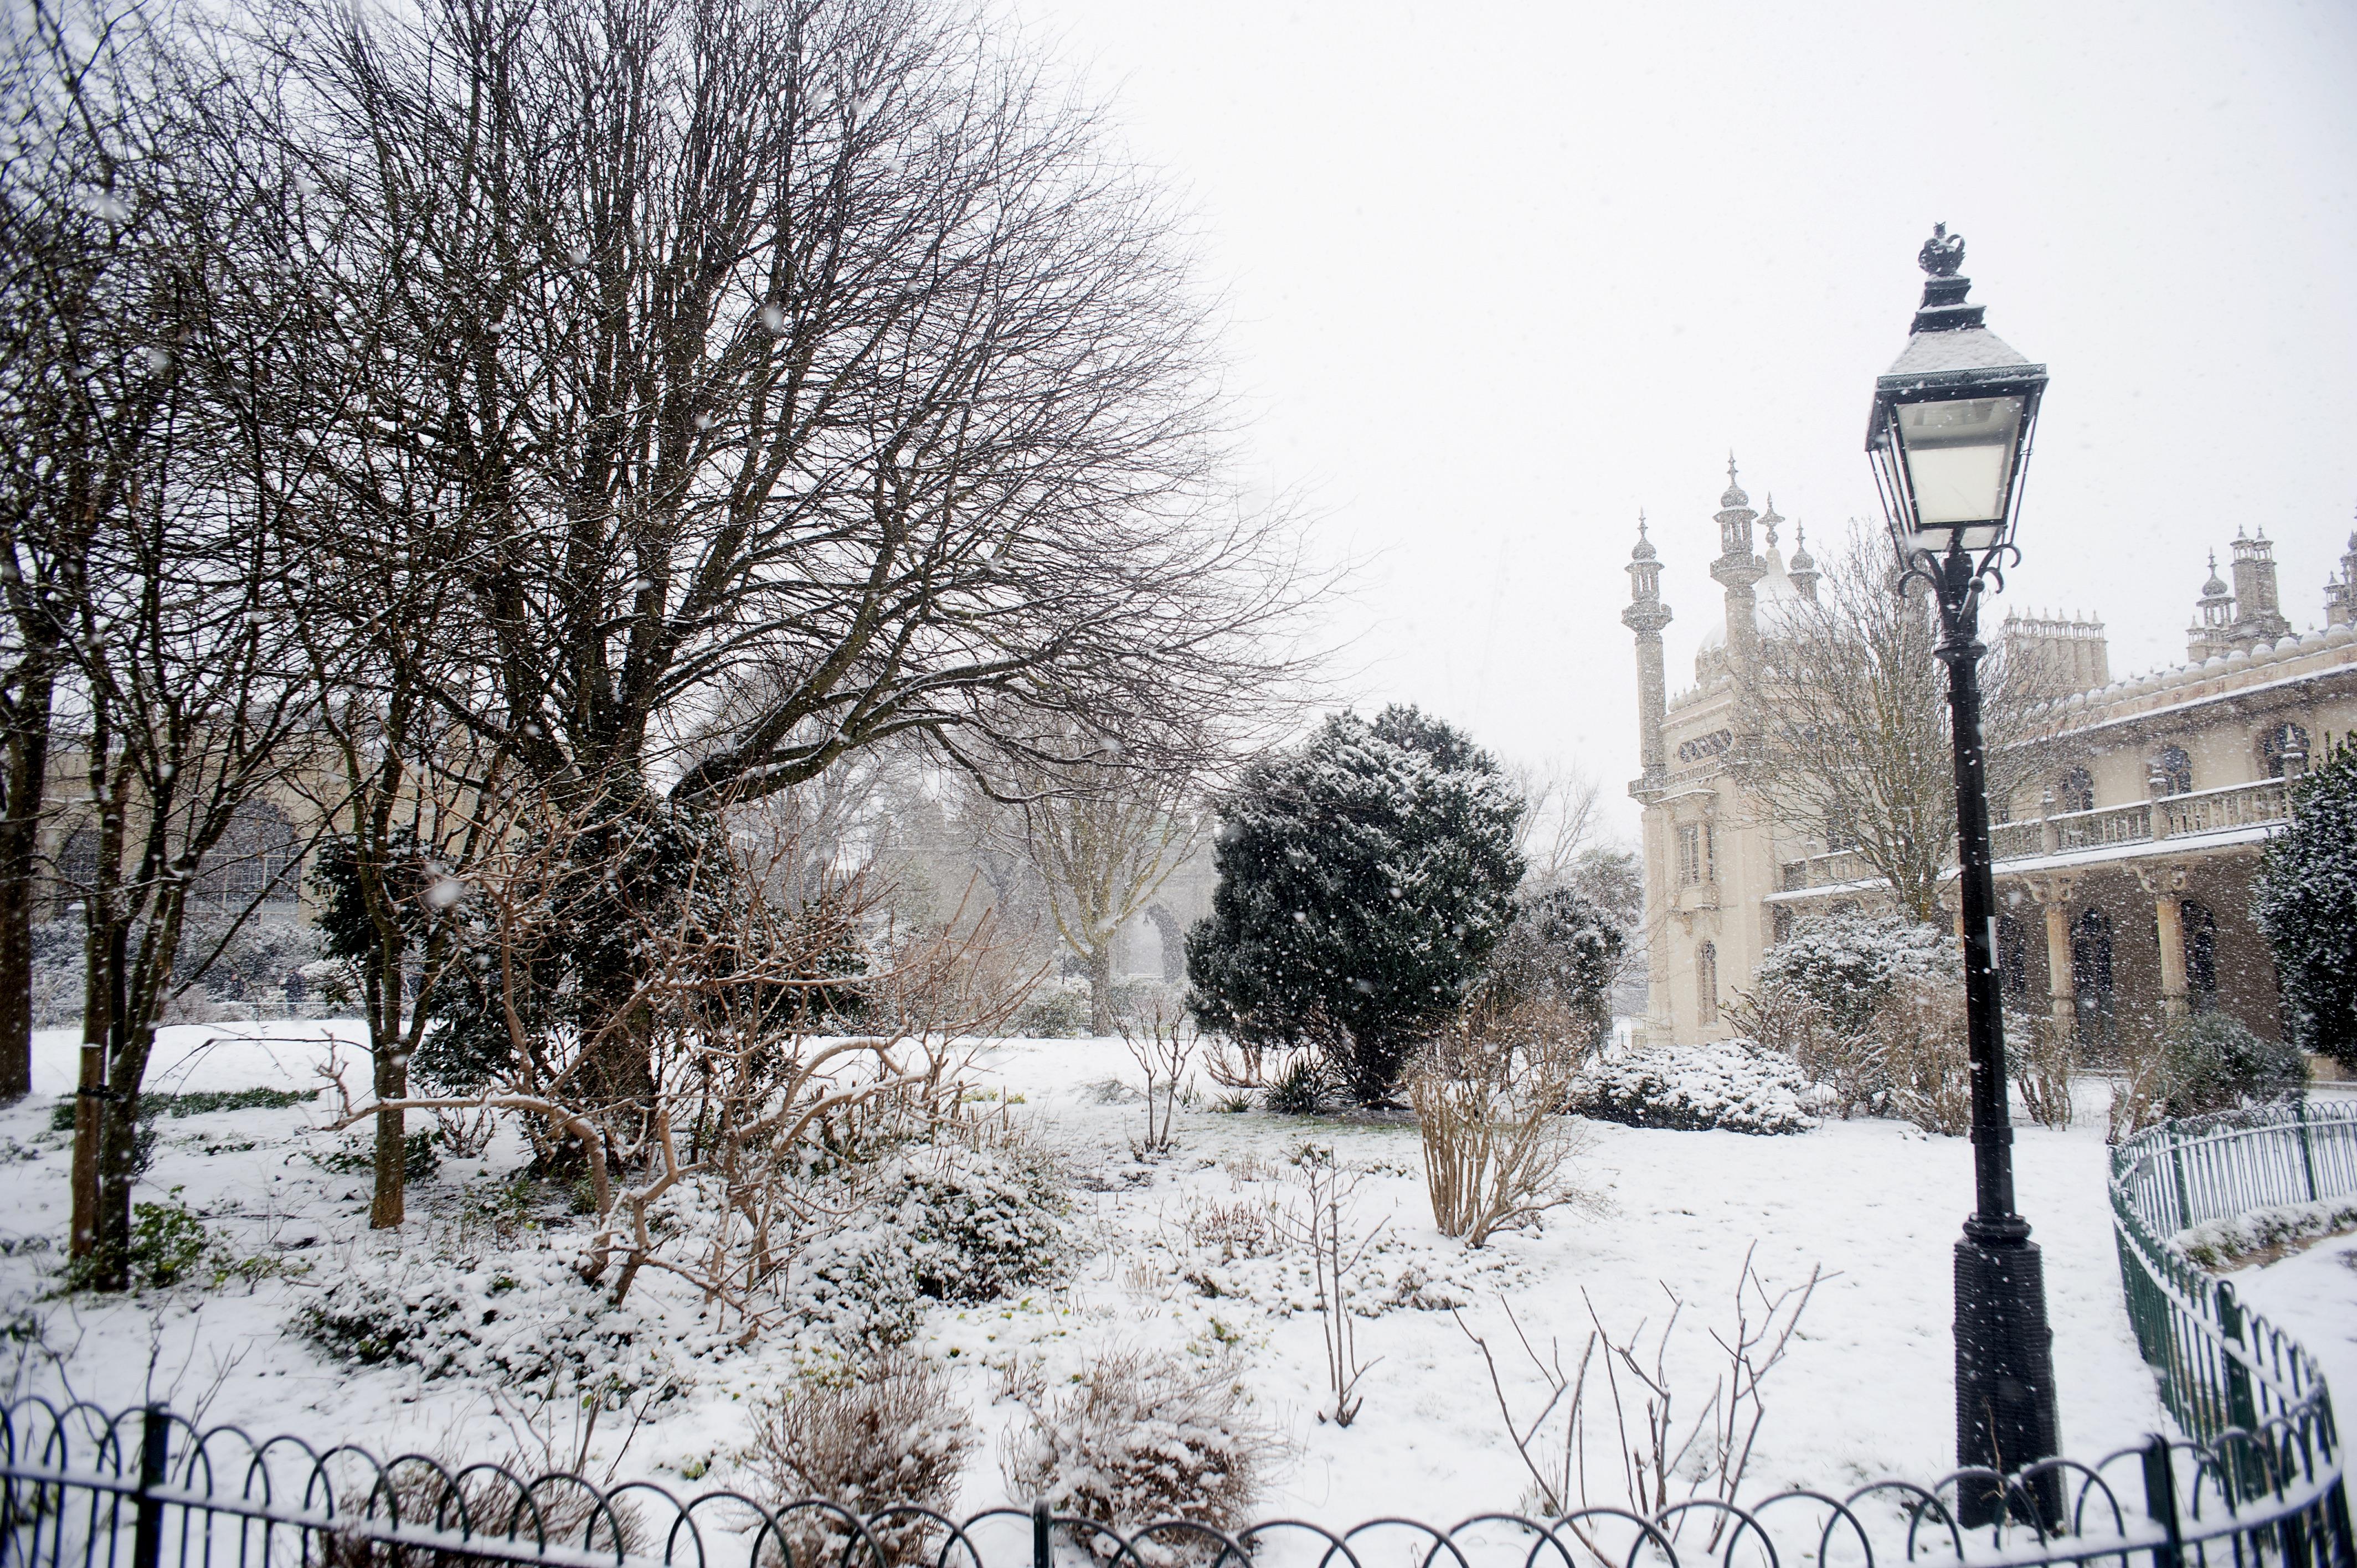 Snowy lampost scene